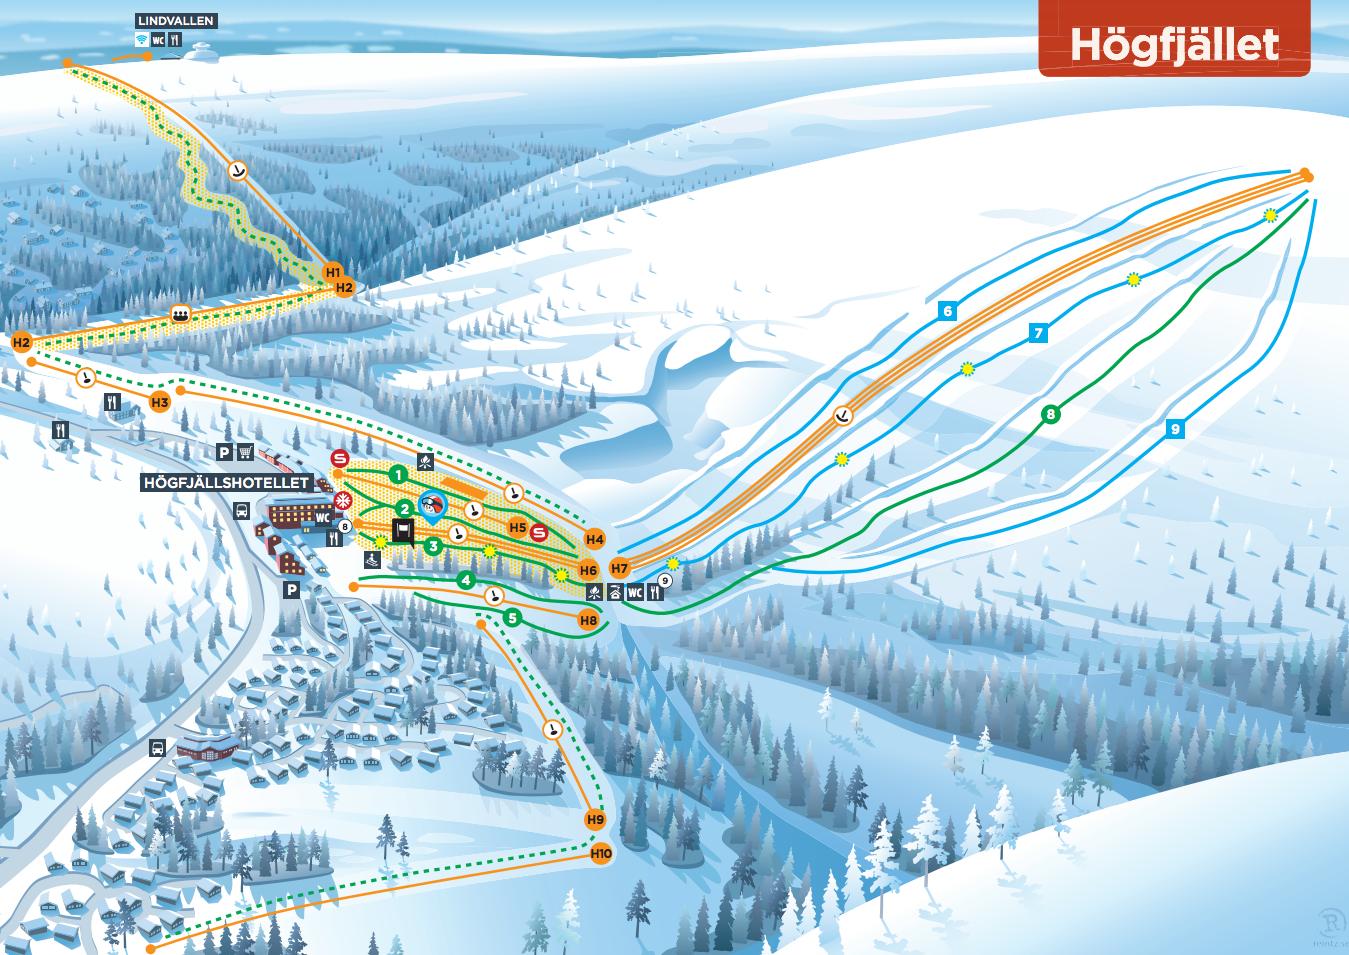 Download Skistars Högfjället piste map as pdf